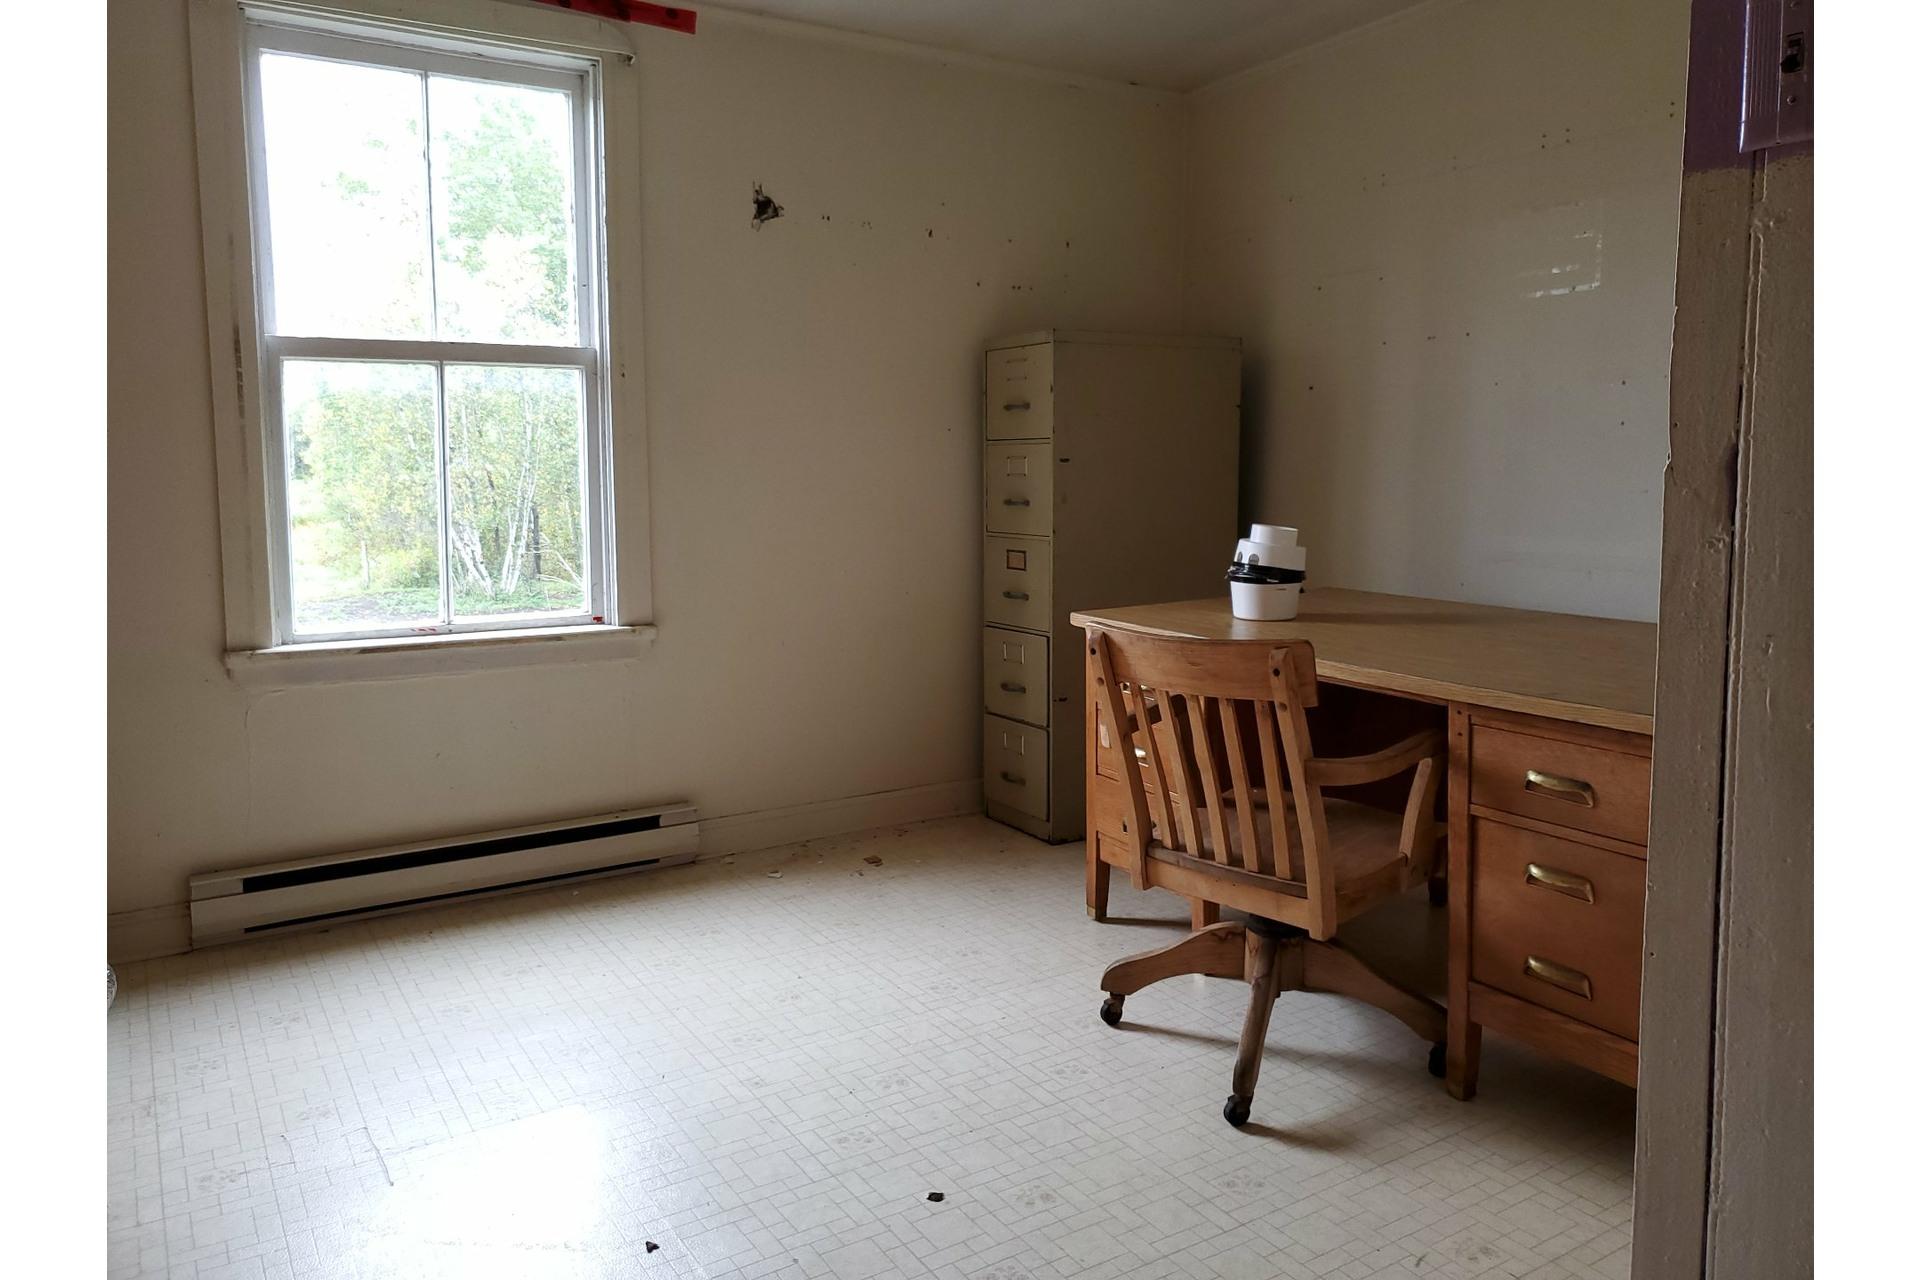 image 26 - Farmhouse For sale Sainte-Marie-de-Blandford - 10 rooms